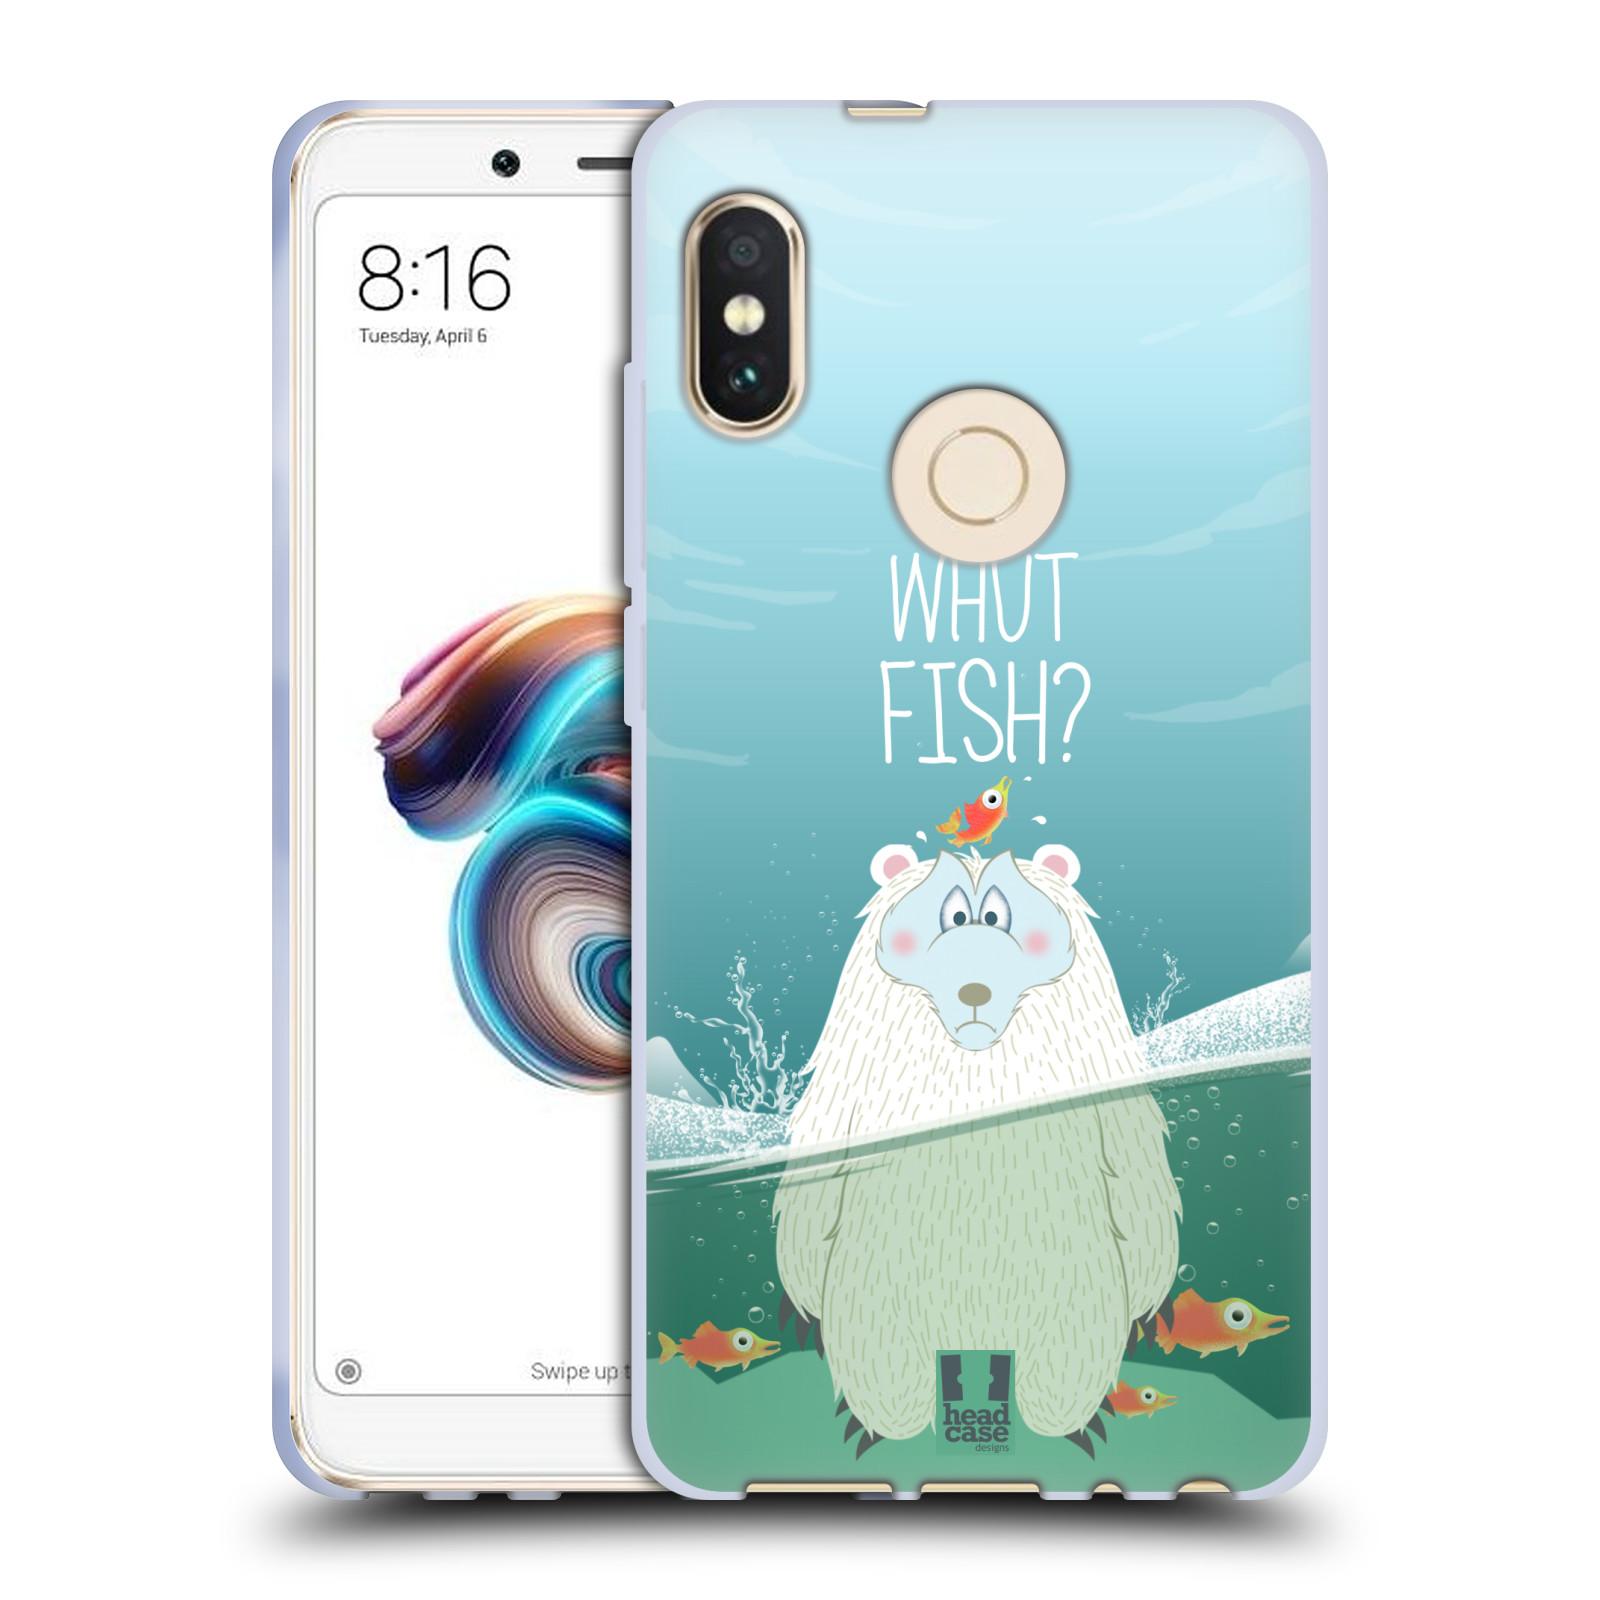 Silikonové pouzdro na mobil Xiaomi Redmi Note 5 - Head Case - Medvěd Whut Fish?